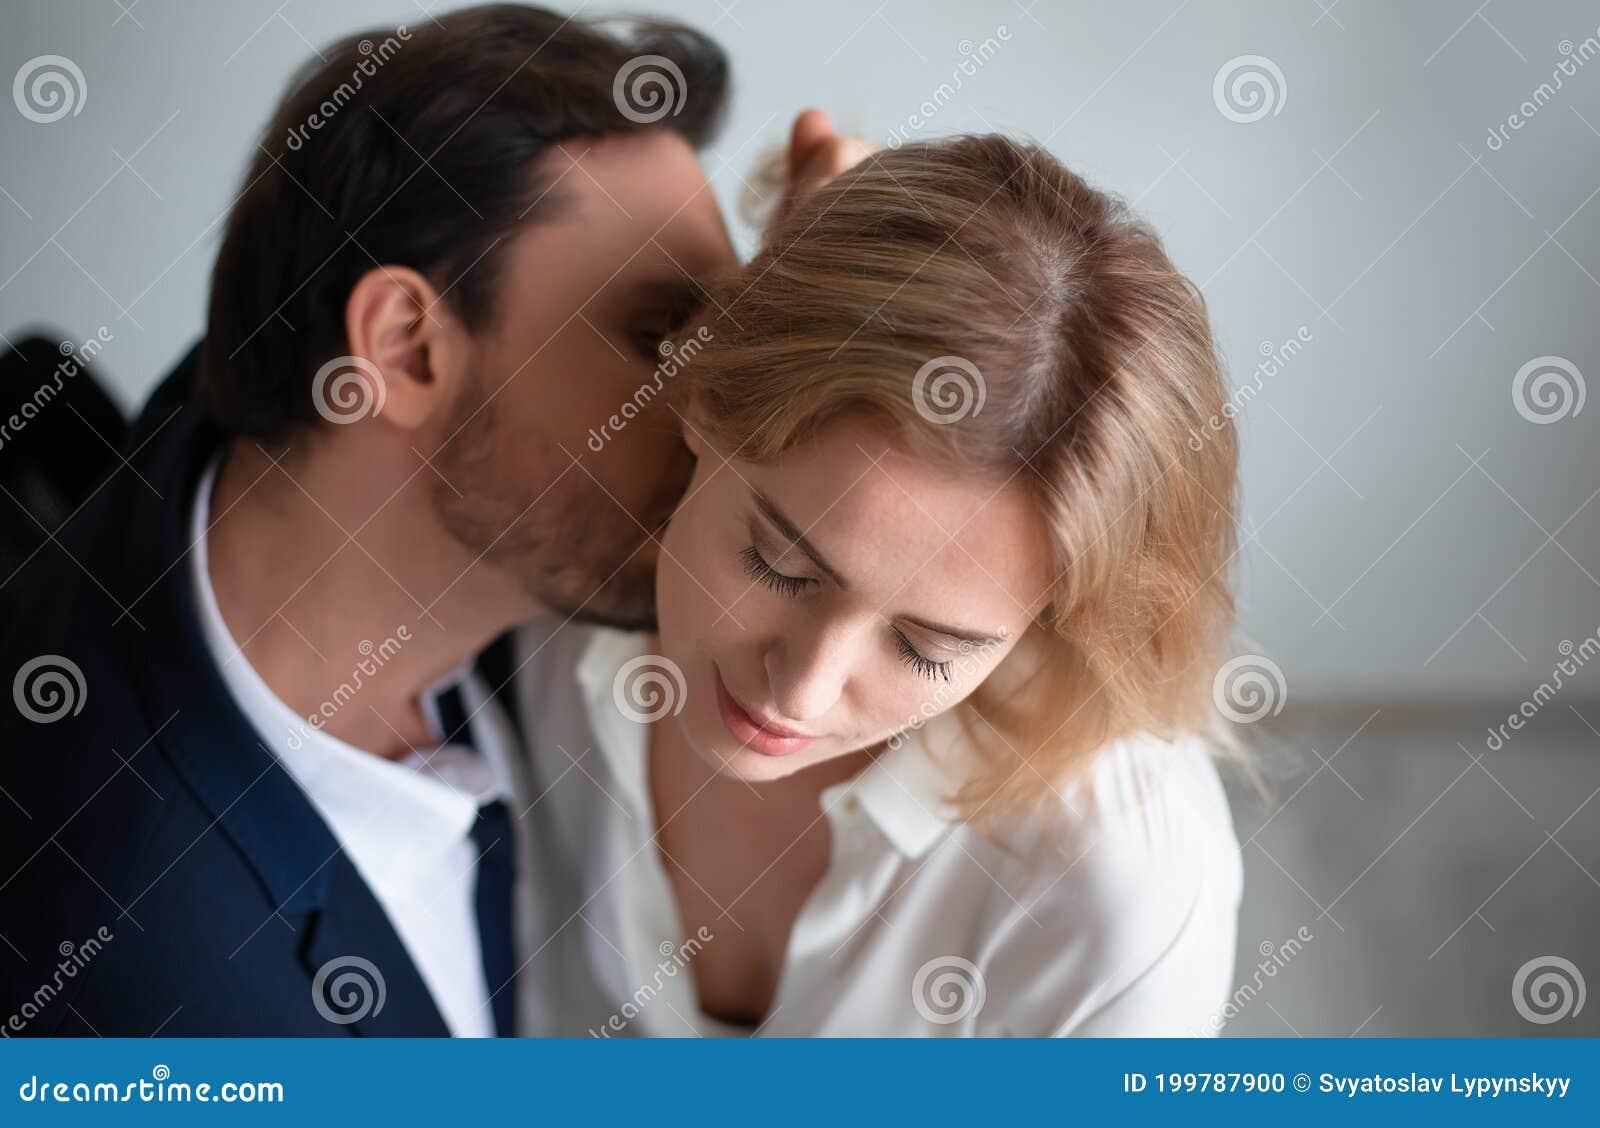 At work men kiss men 10 Ways